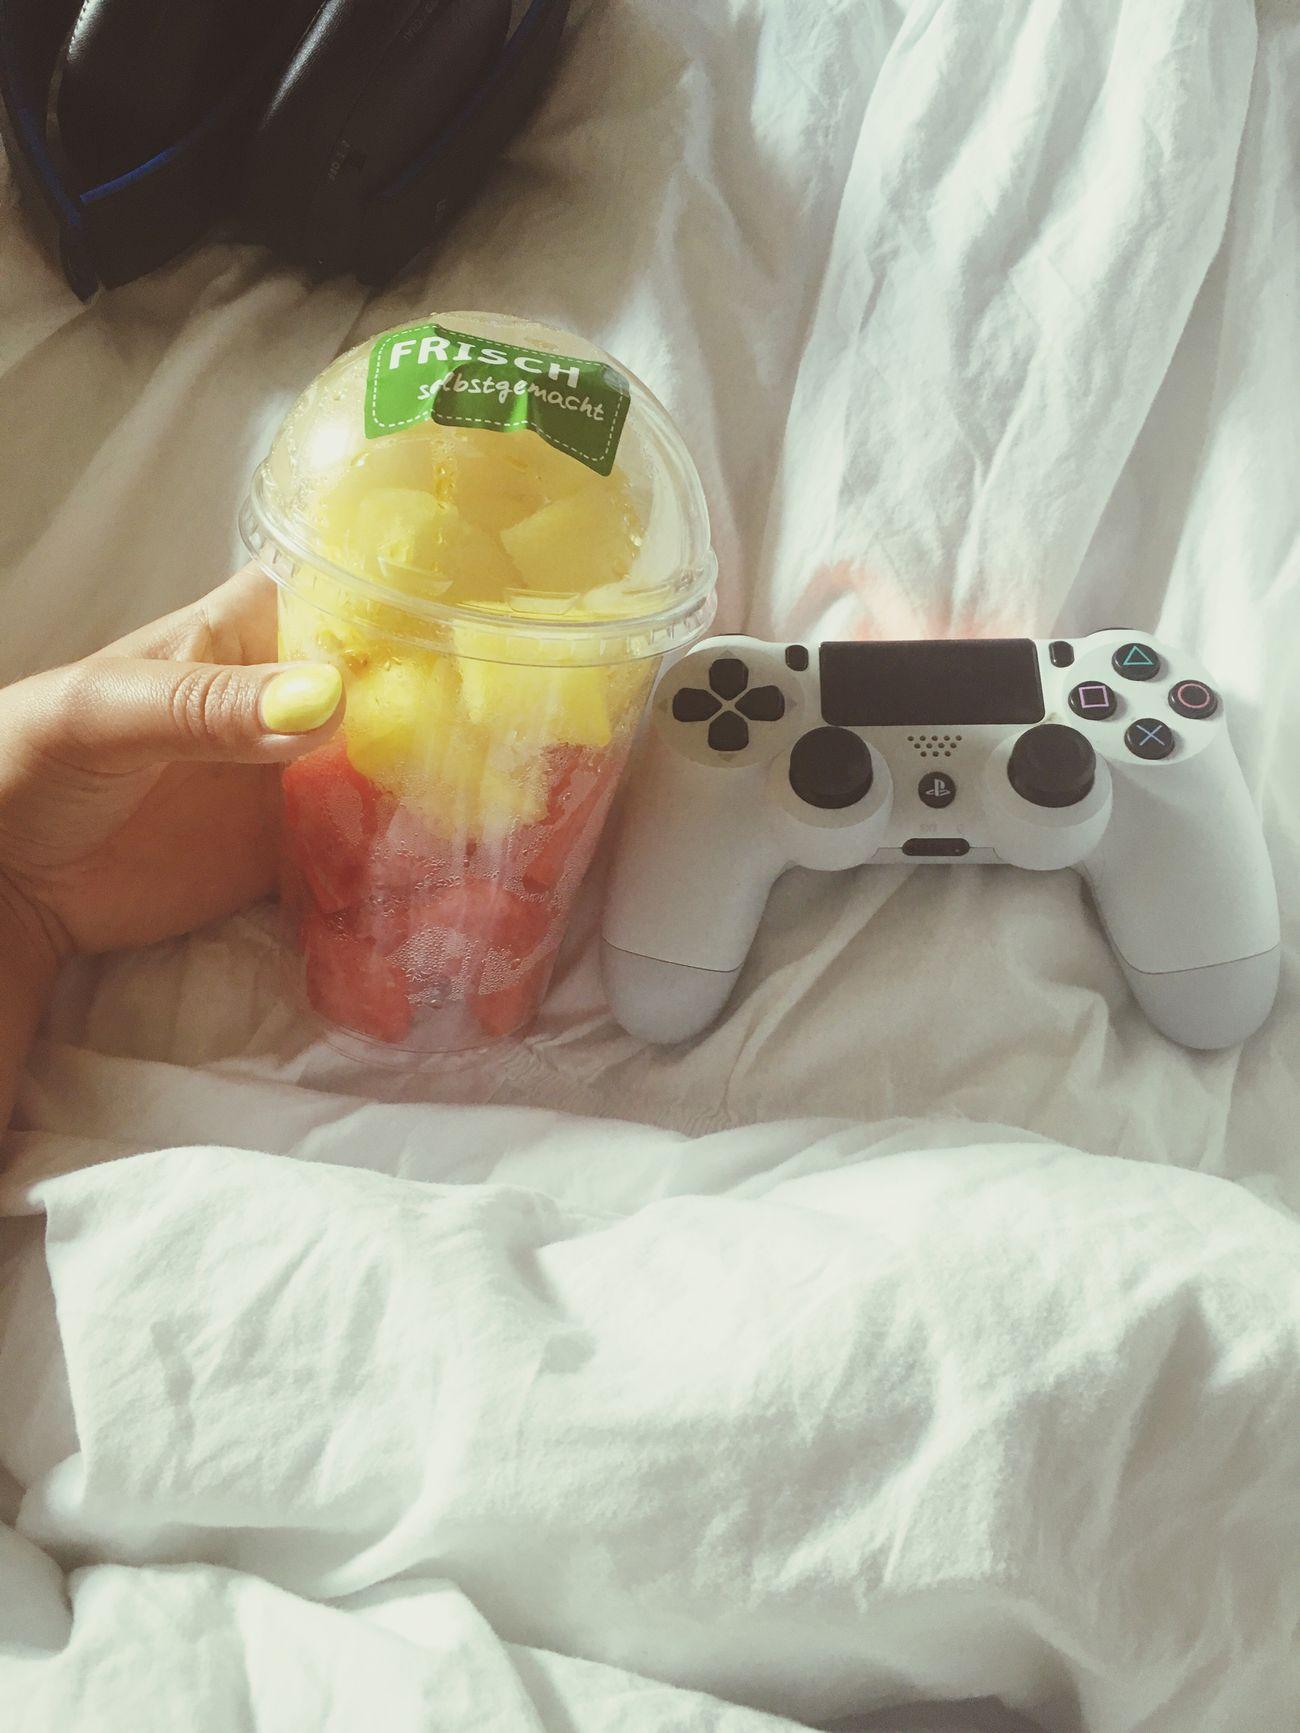 Athome  Blackops3 Videogames CallOfDuty PS4 EatHealthy Gamergirl Having Fun Ps4 Controller Eat healthy n play ps4 🙈😍🙌🏻🍉